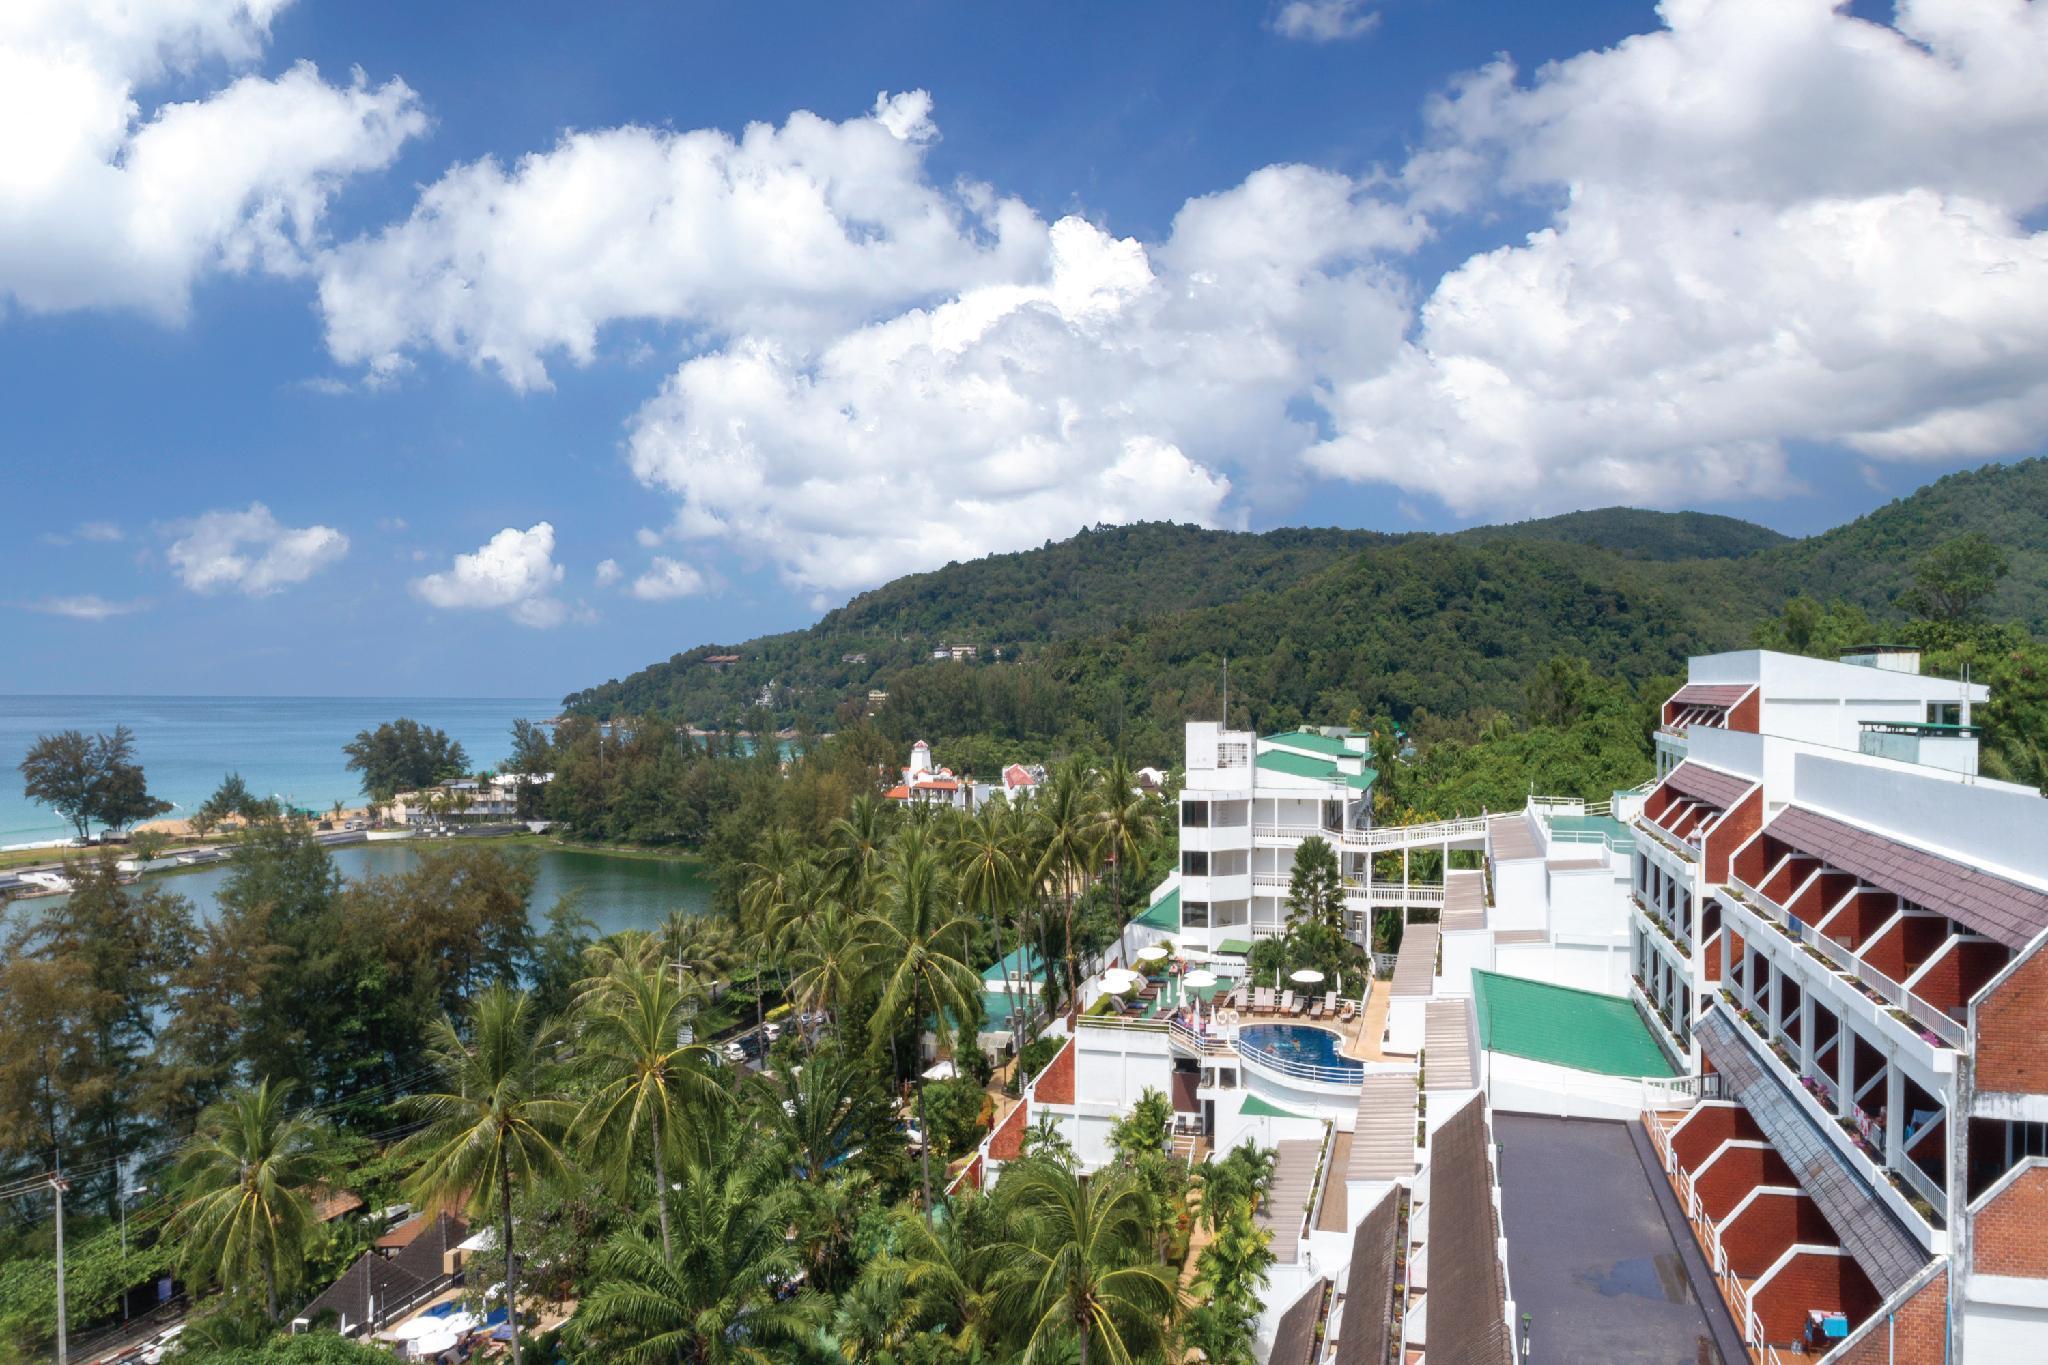 Best Western Phuket Ocean Resort โรงแรม เบสท์เวสเทิร์น ภูเก็ตโอเชียนรีสอร์ท